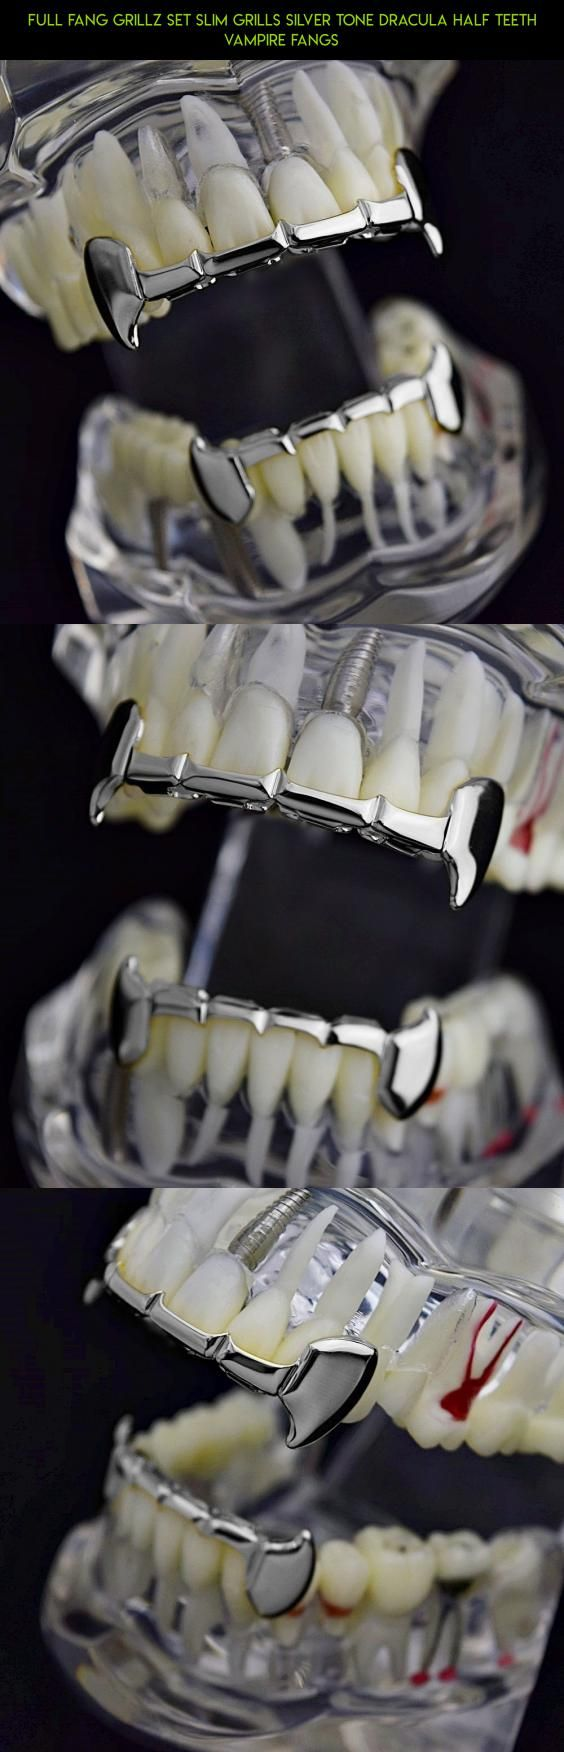 Full Fang Grillz Set Slim Grills Silver Tone Dracula Half Teeth Vampire Fangs #racing #gadgets #tech #drone #shopping #parts #products #vampire #fpv #plans #camera #kit #technology #grills